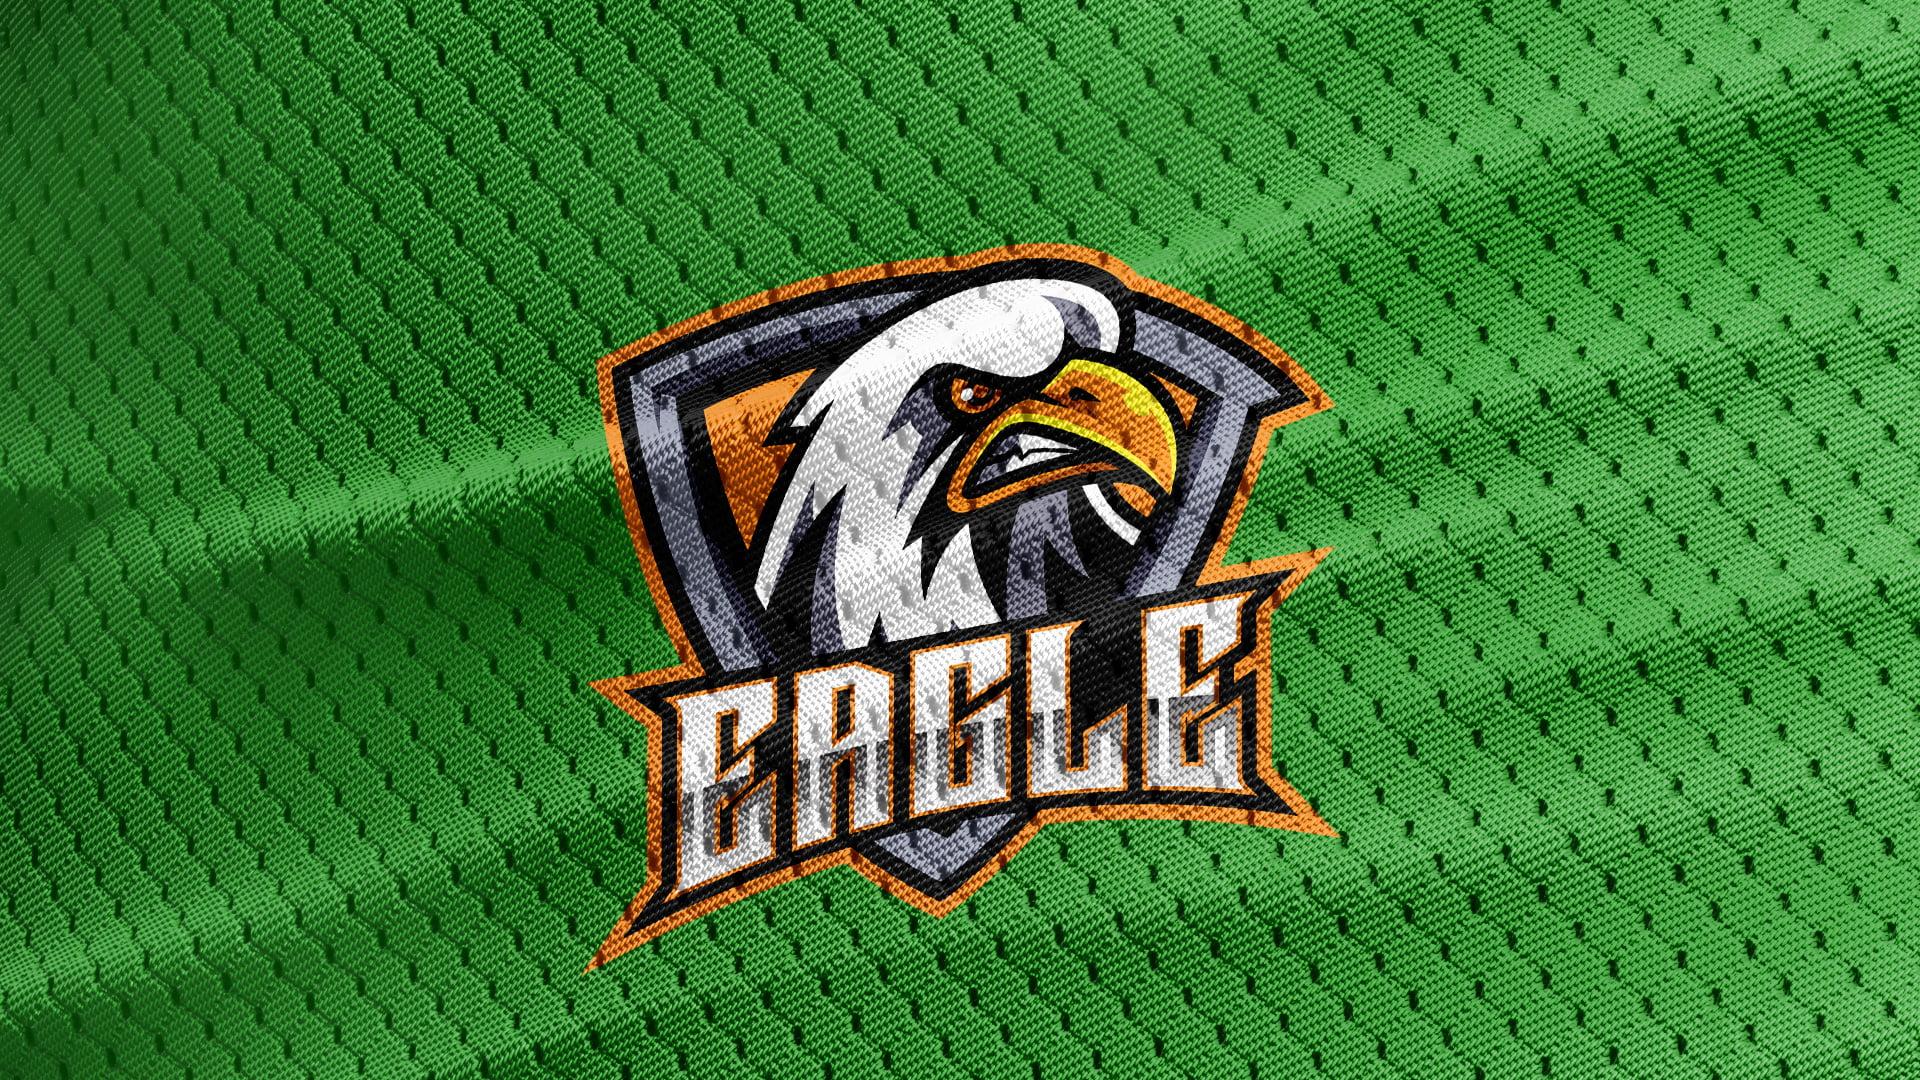 Greeen-Jersey-Texture-Free-Eagle-Logo-Mascot